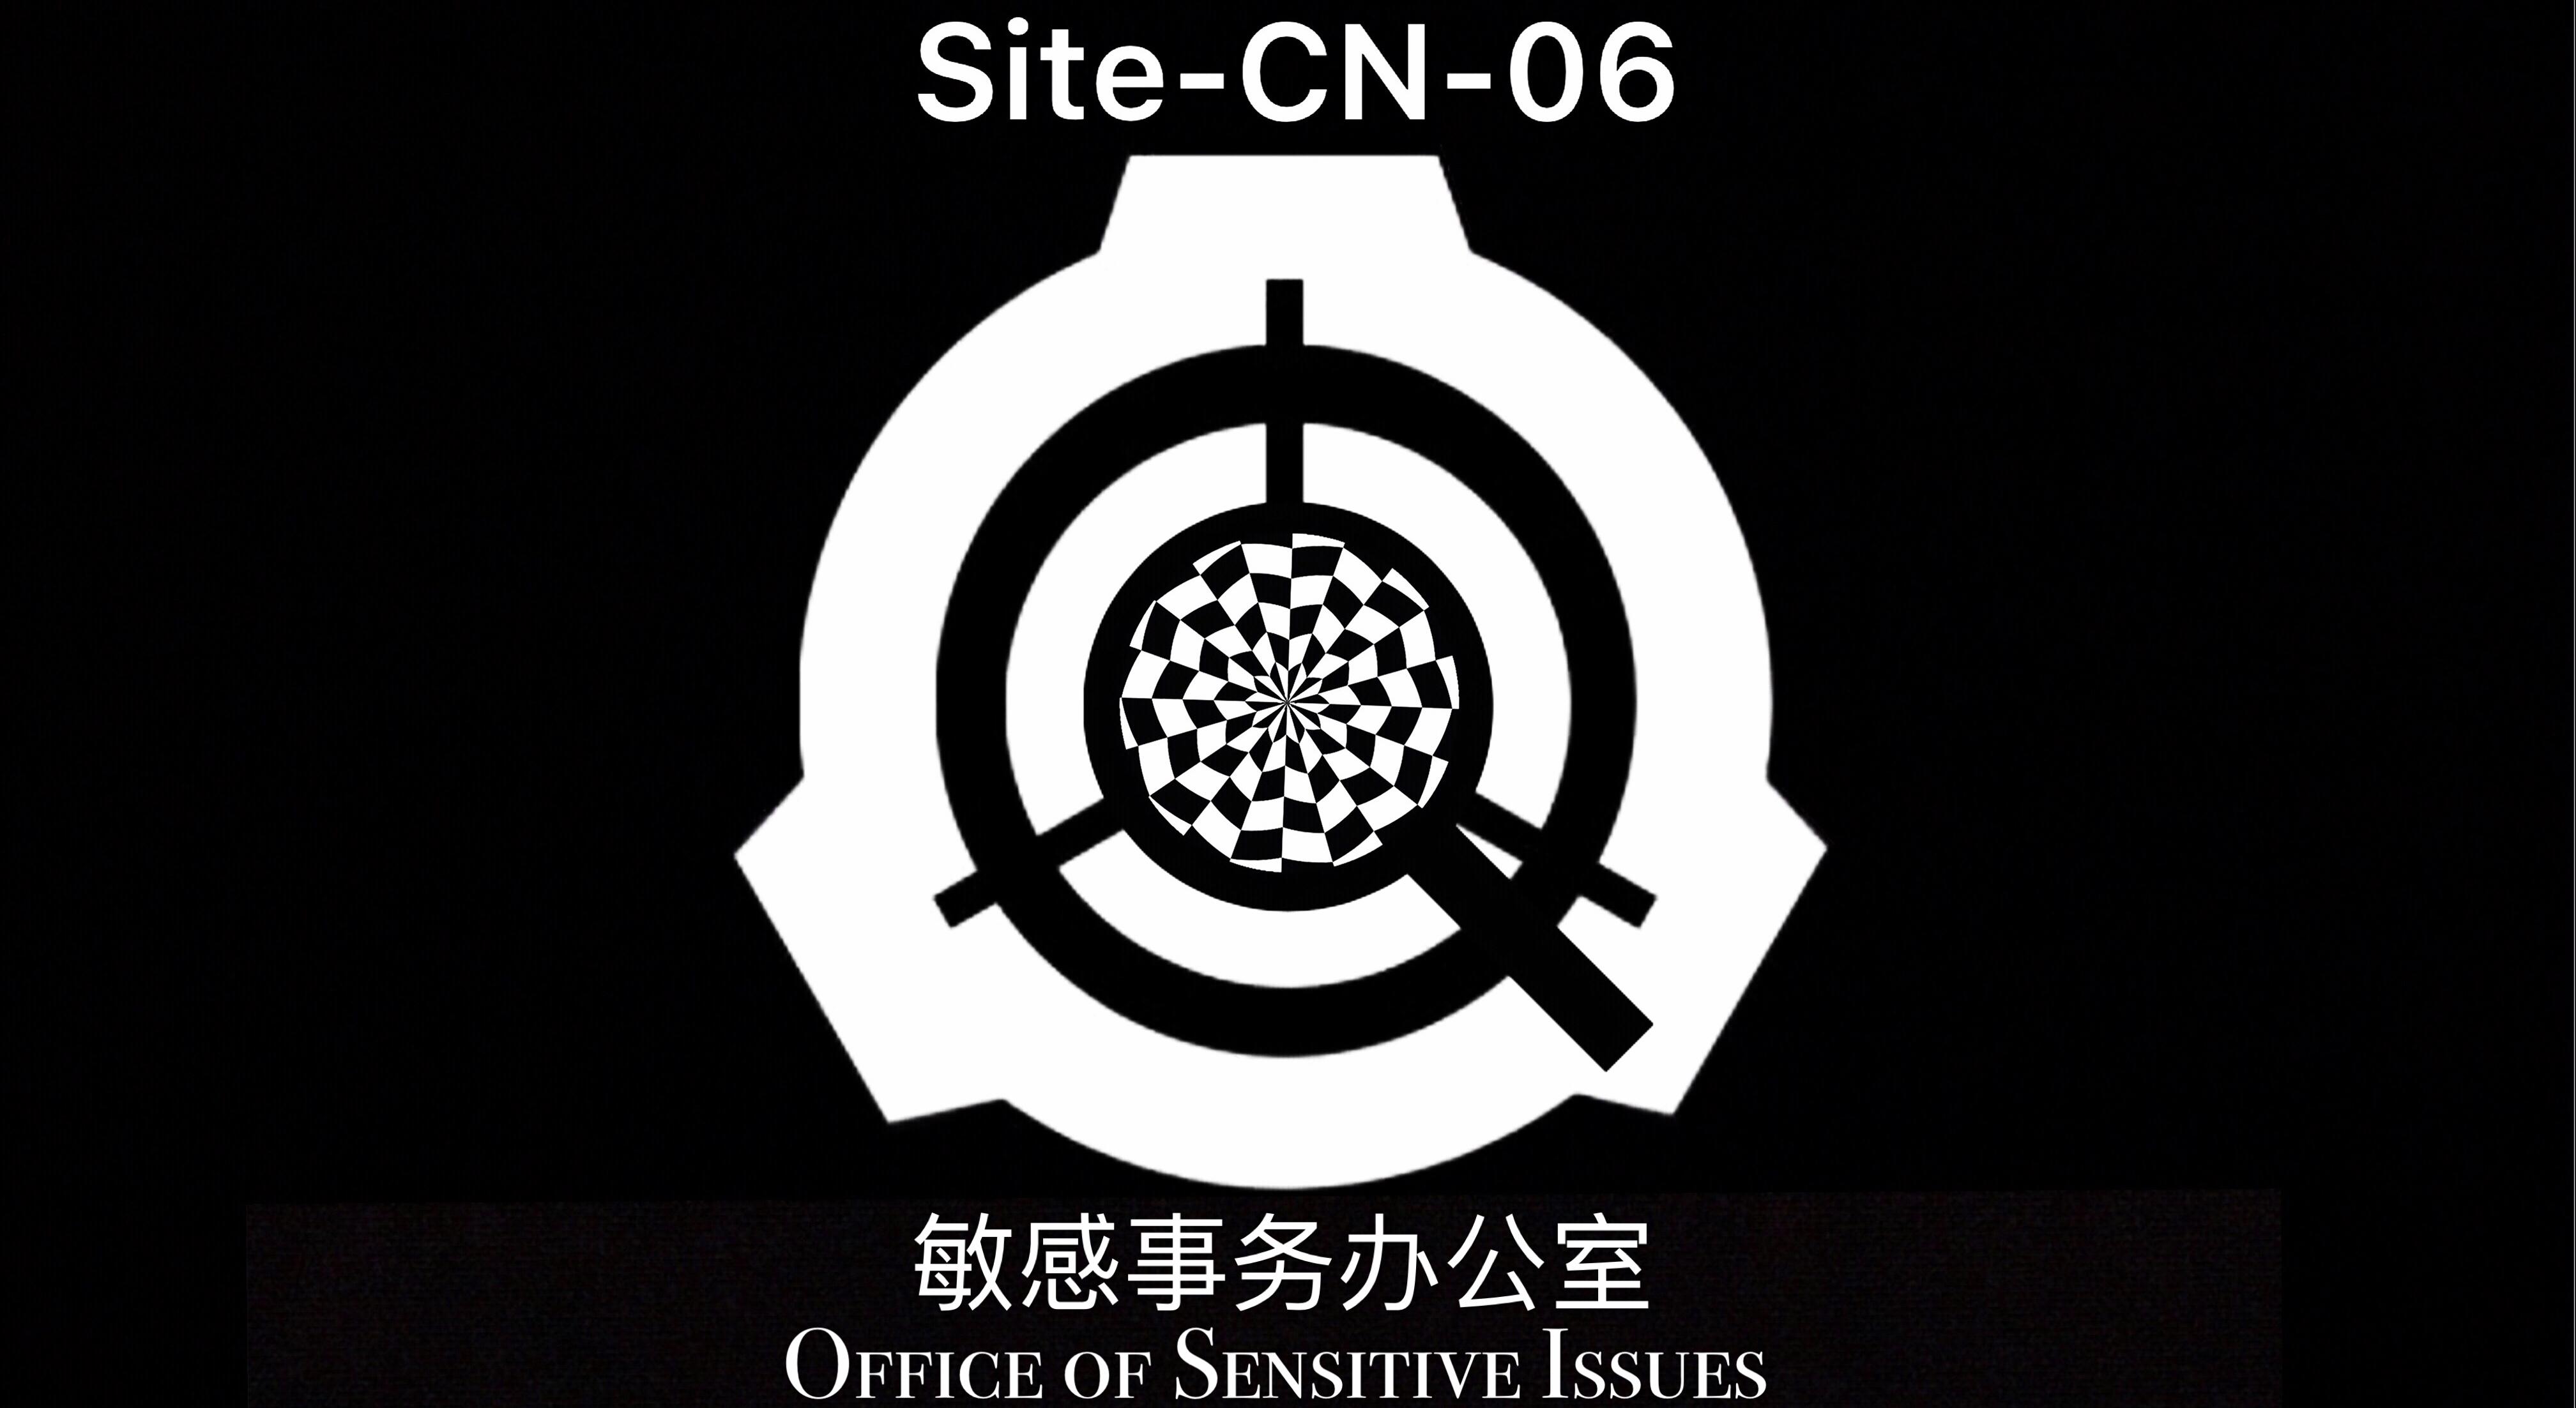 CY3qV1.jpg